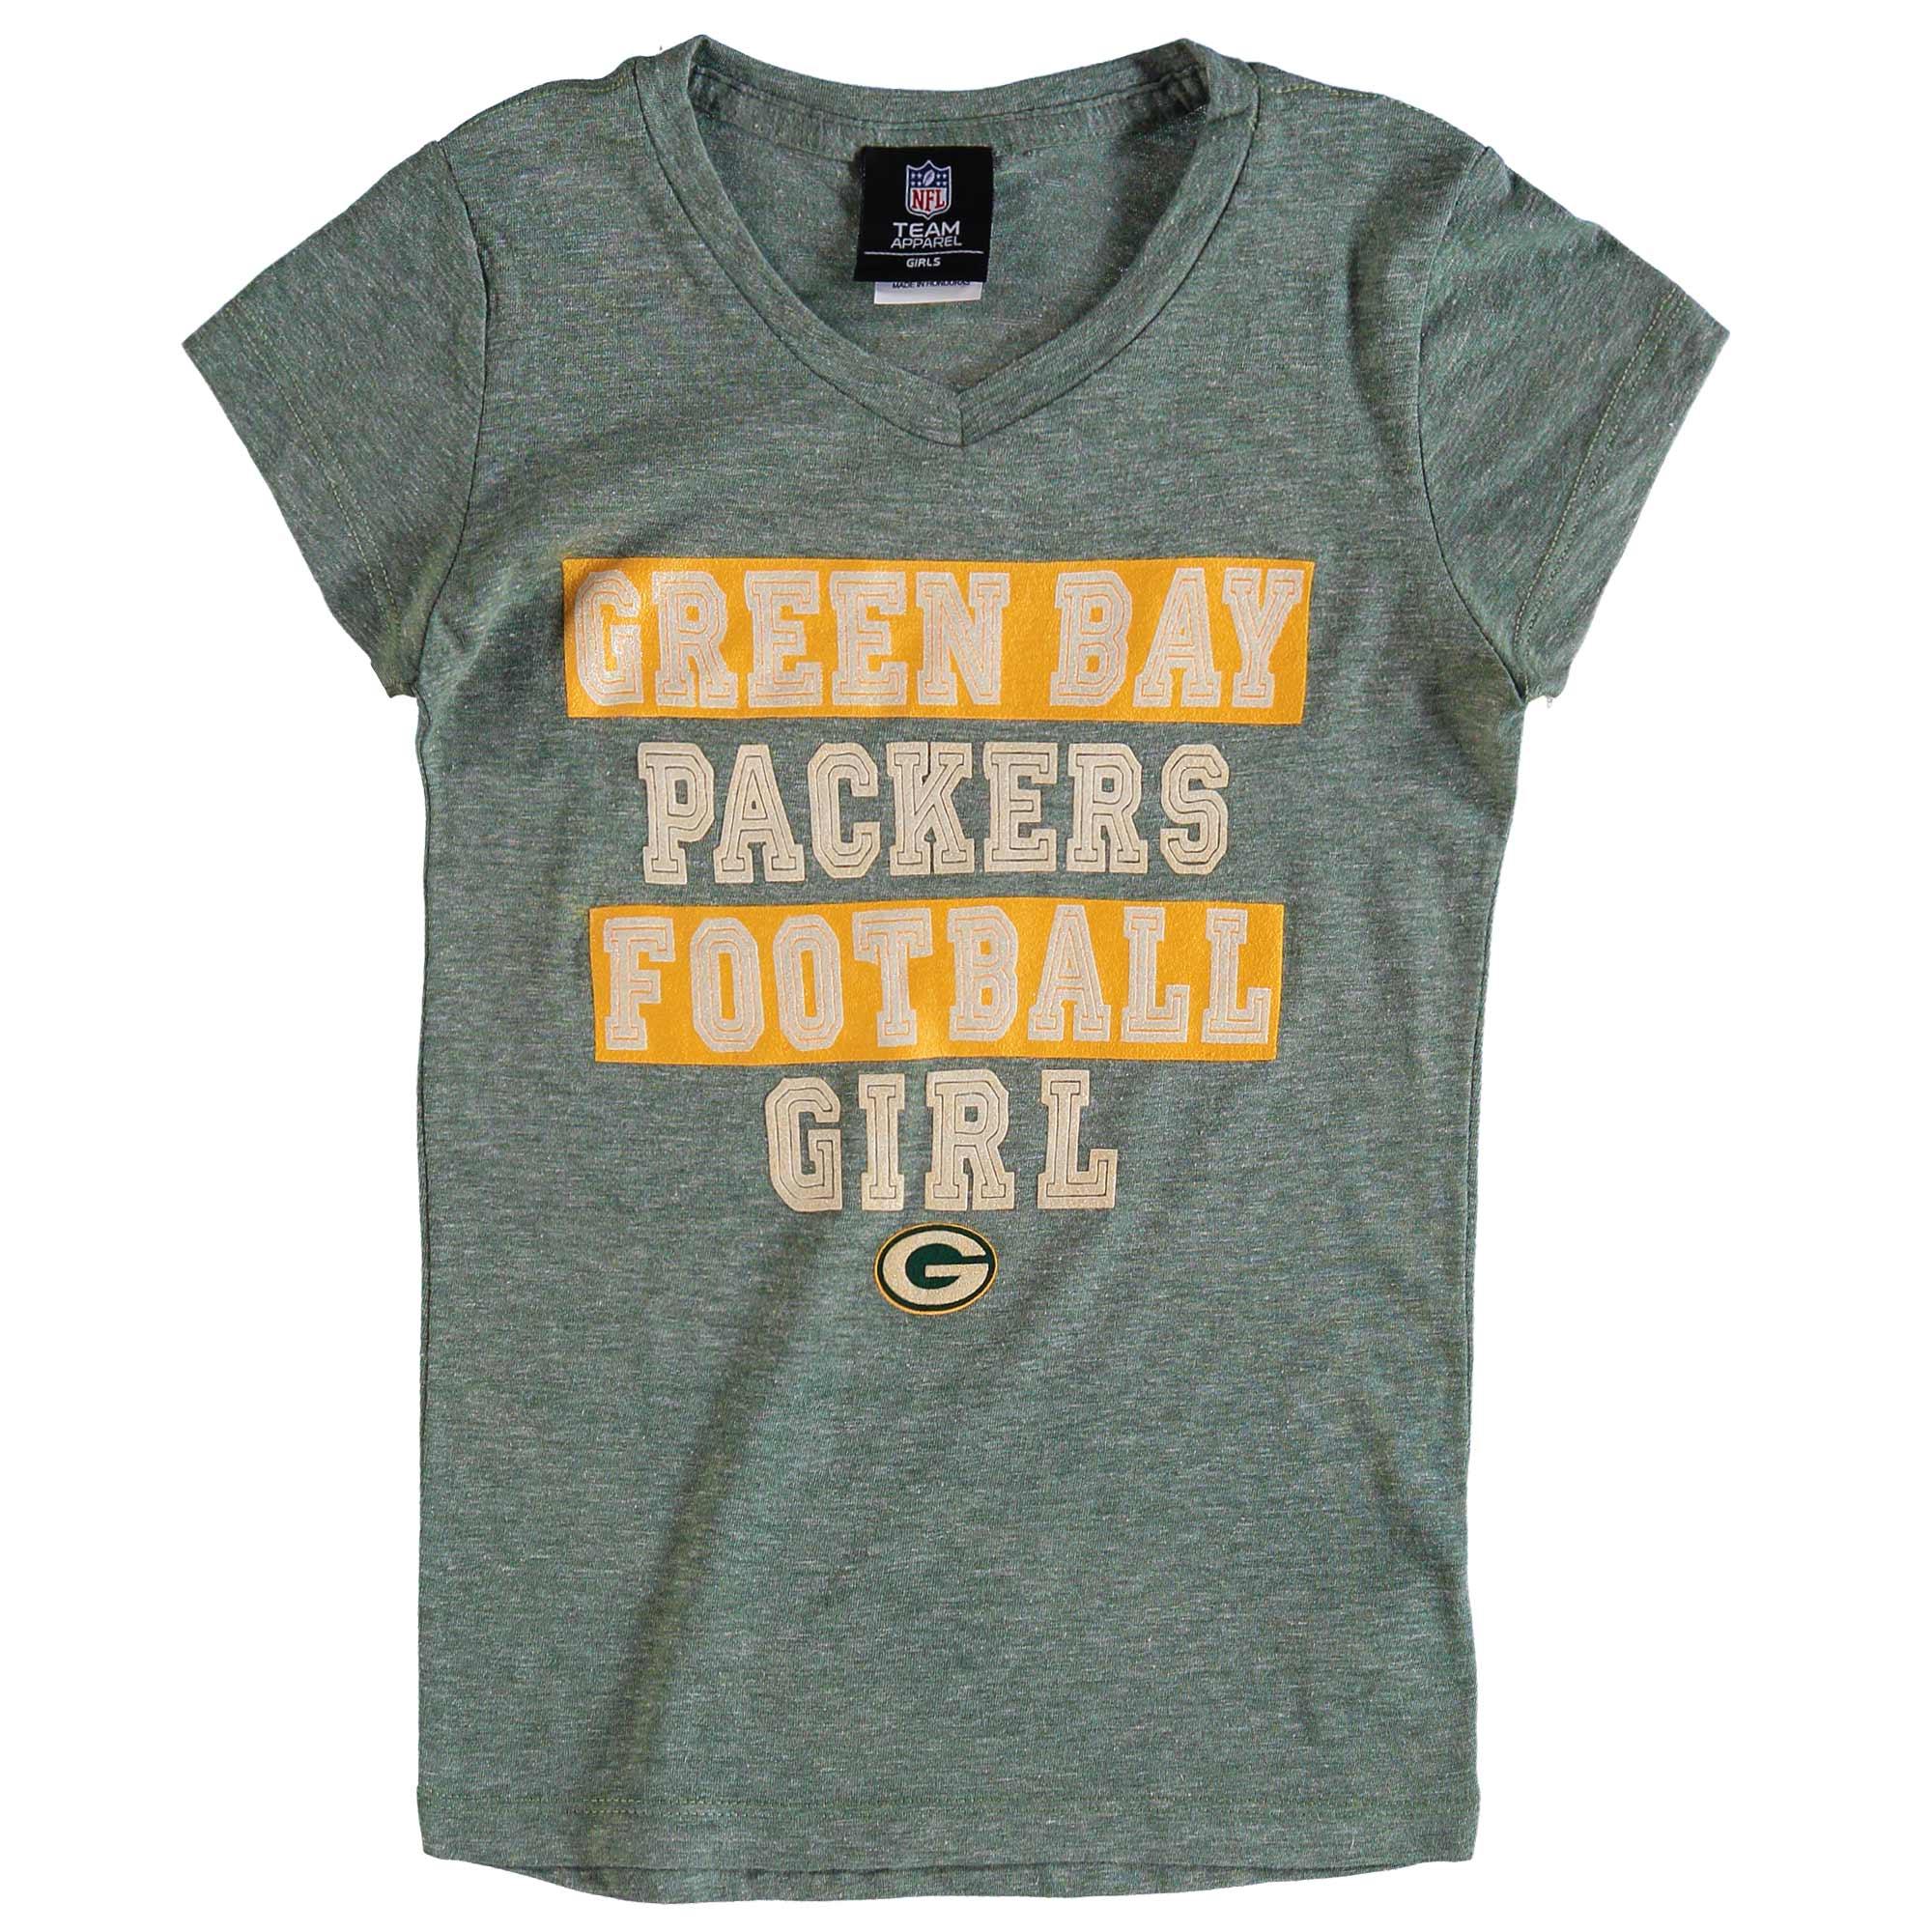 Green Bay Packers 5th & Ocean by New Era Girls Youth Football Girl Tri-Blend V-Neck T-Shirt - Green